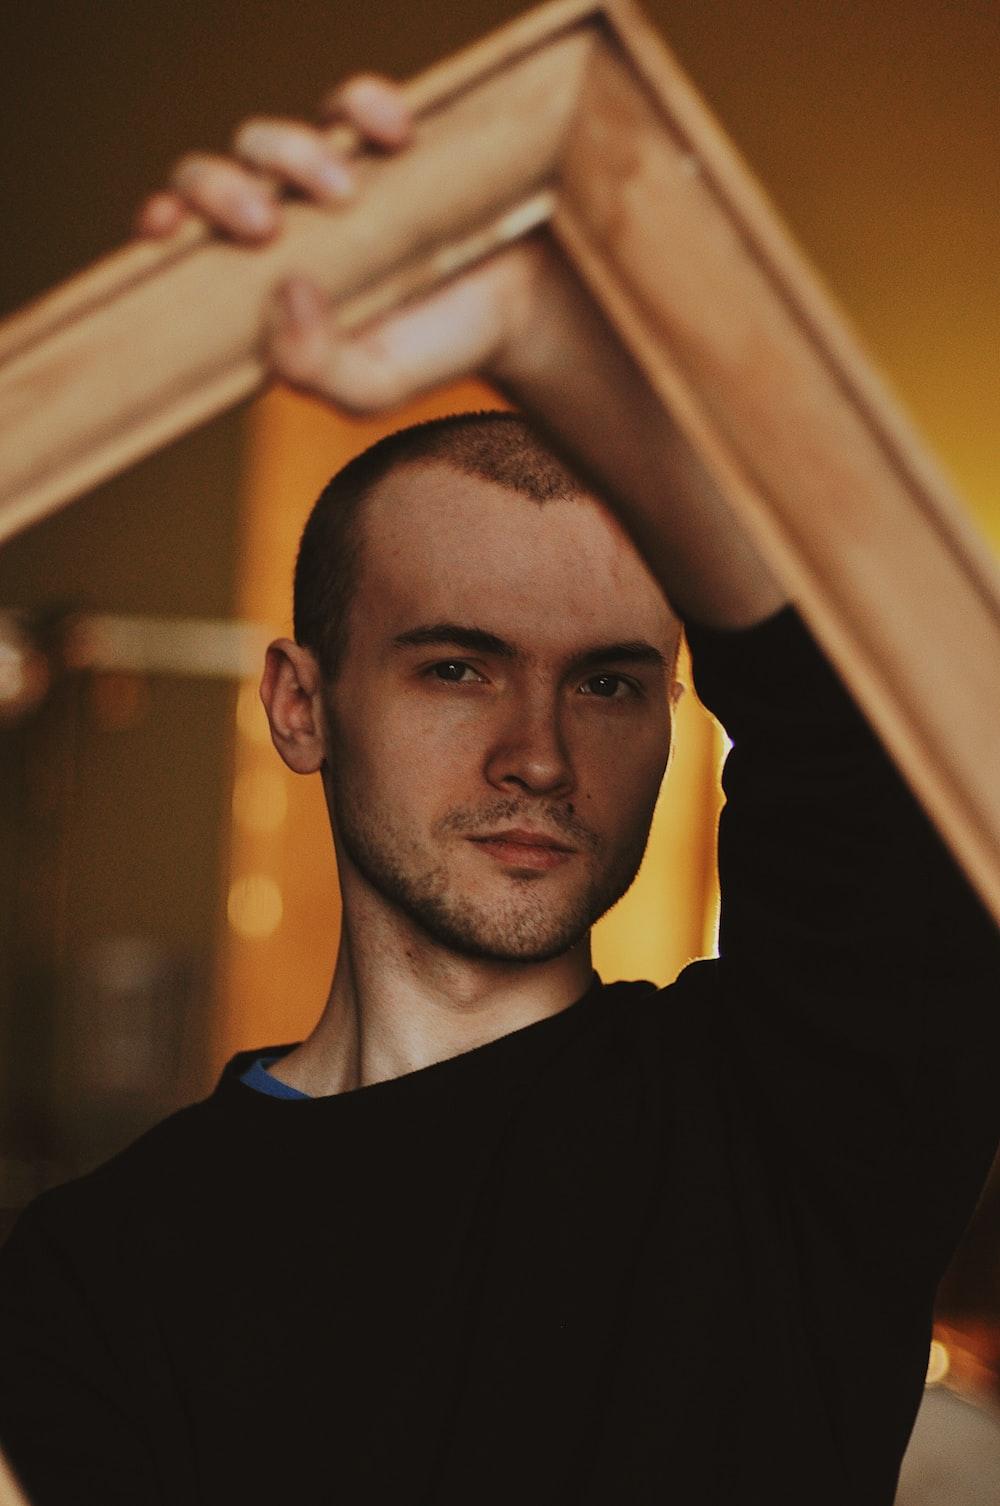 man holding wooden frame